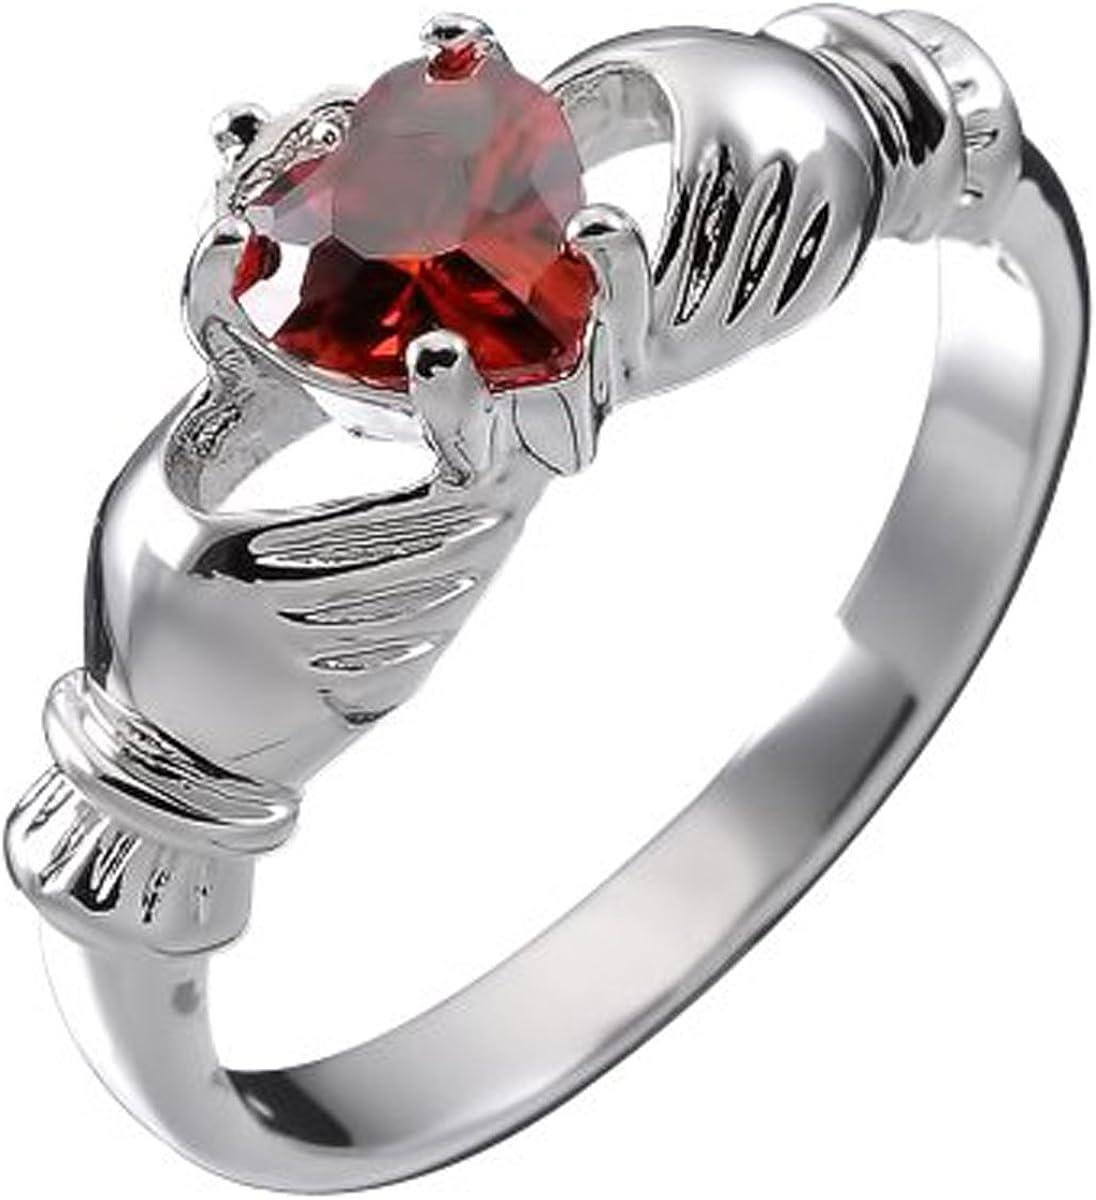 GWG Jewellery Anillos Mujer Regalo Anillo de Claddagh Plata de Ley Dos Manos Que Rodean Corazón de Circonita de Color Rubí Rojo con Corona para Mujeres